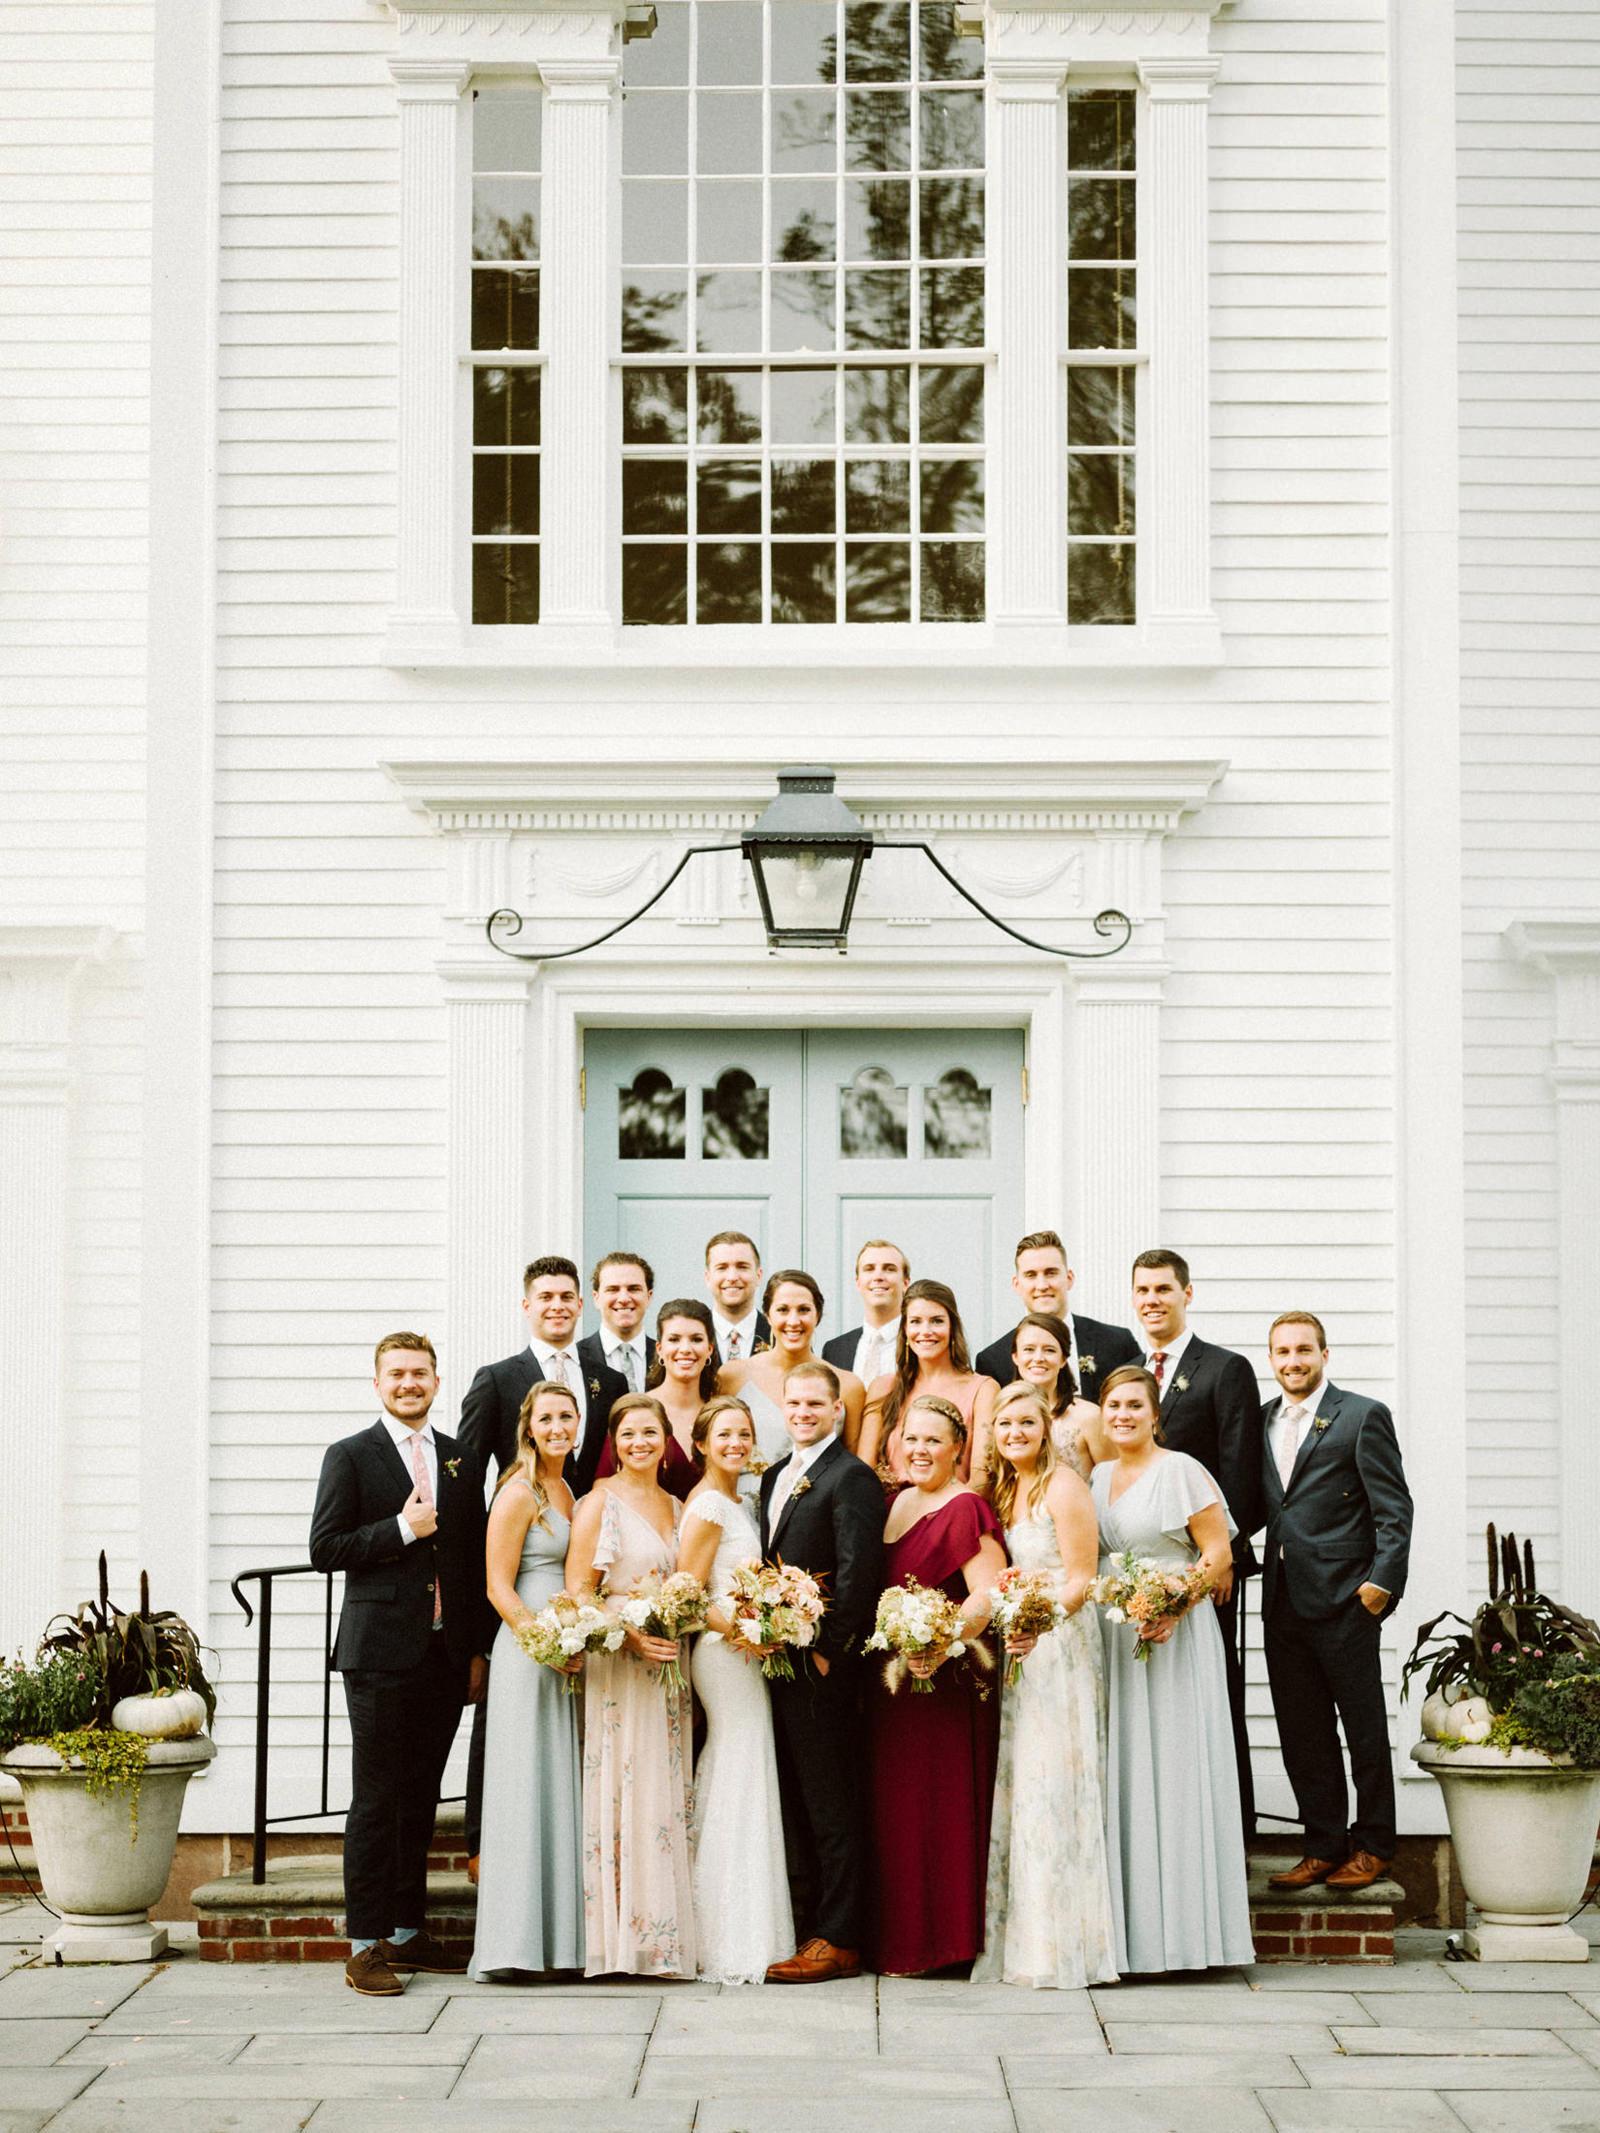 bridgeport-wedding-088 BRIDGEPORT, CONNECTICUT BACKYARD WEDDING